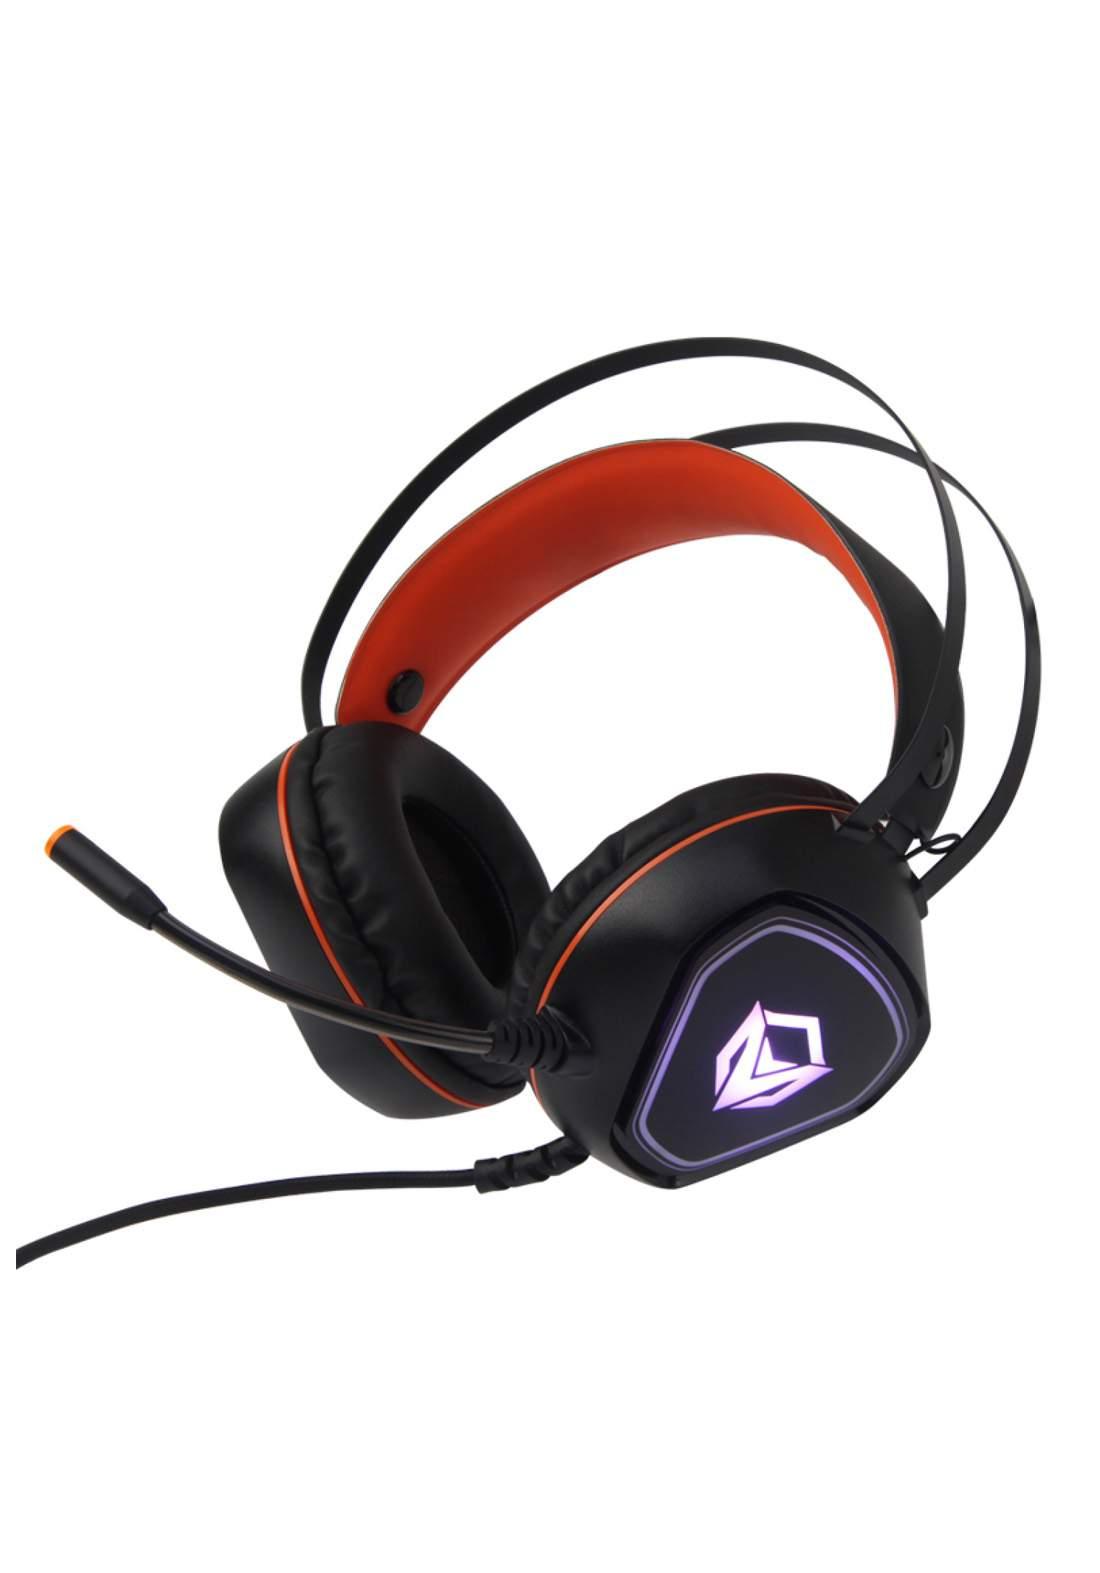 Meetion MT-HP020 Backlit Gaming Headset - Orange سماعة سلكية